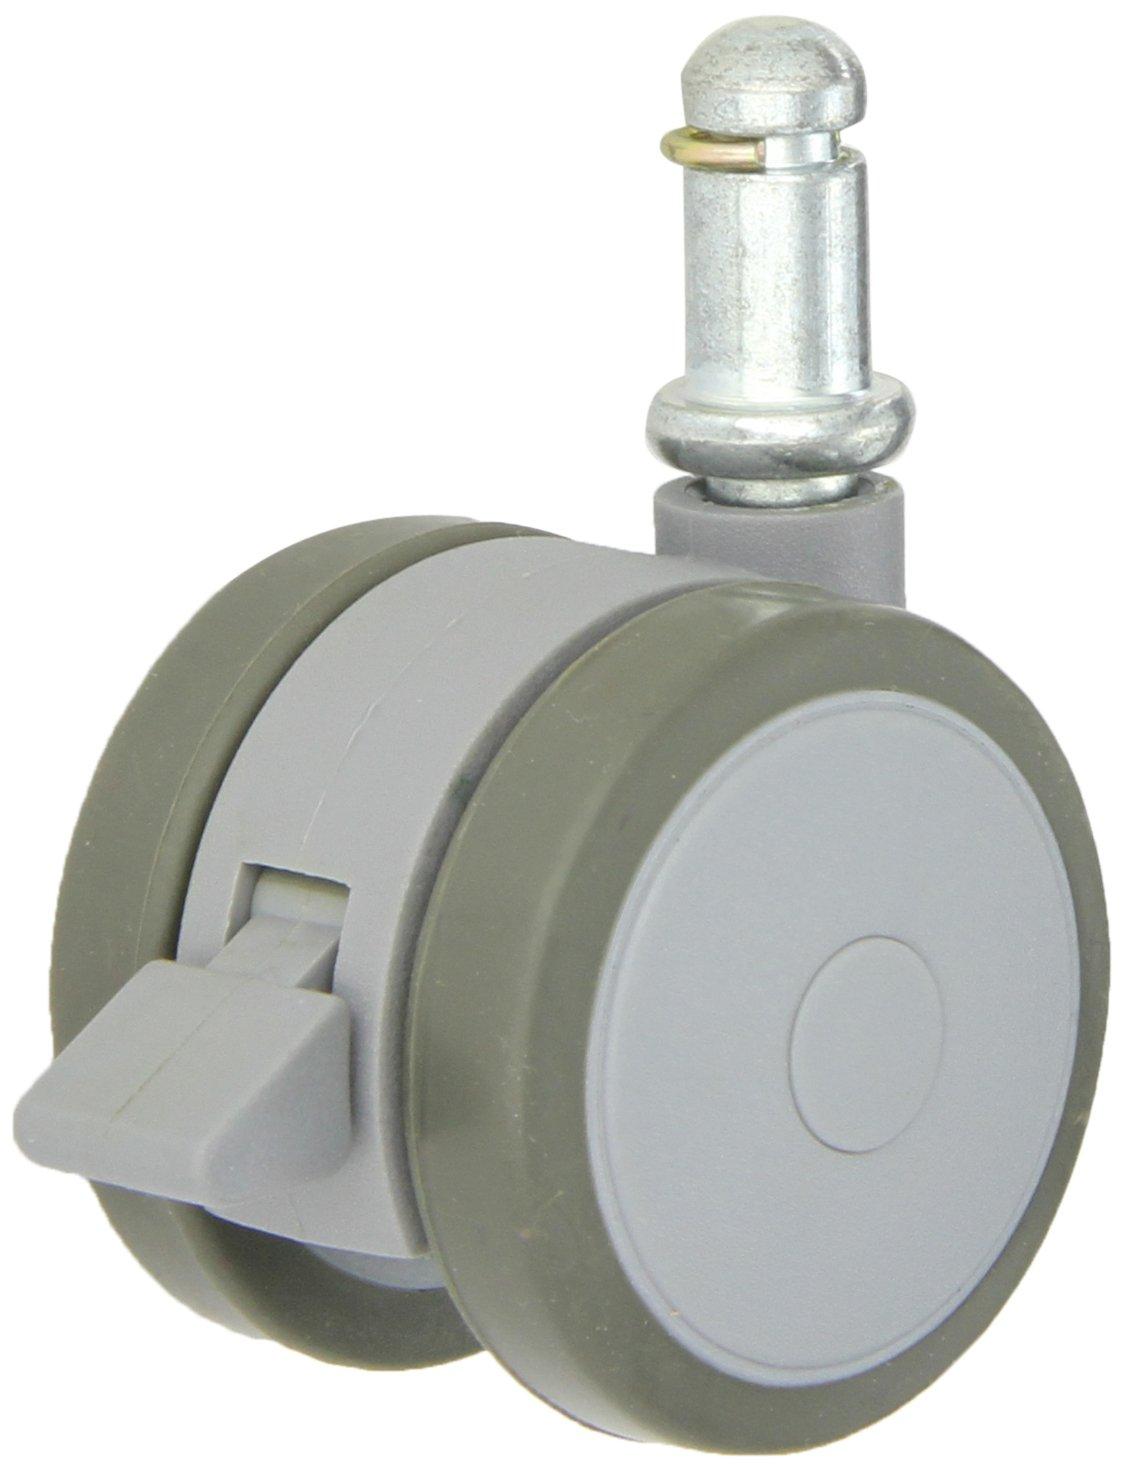 Shepherd Softech Series 50mm Diameter Soft Tread Unhooded Twin Thermoplastic Elastomer Wheel Caster with Brake, 7/16